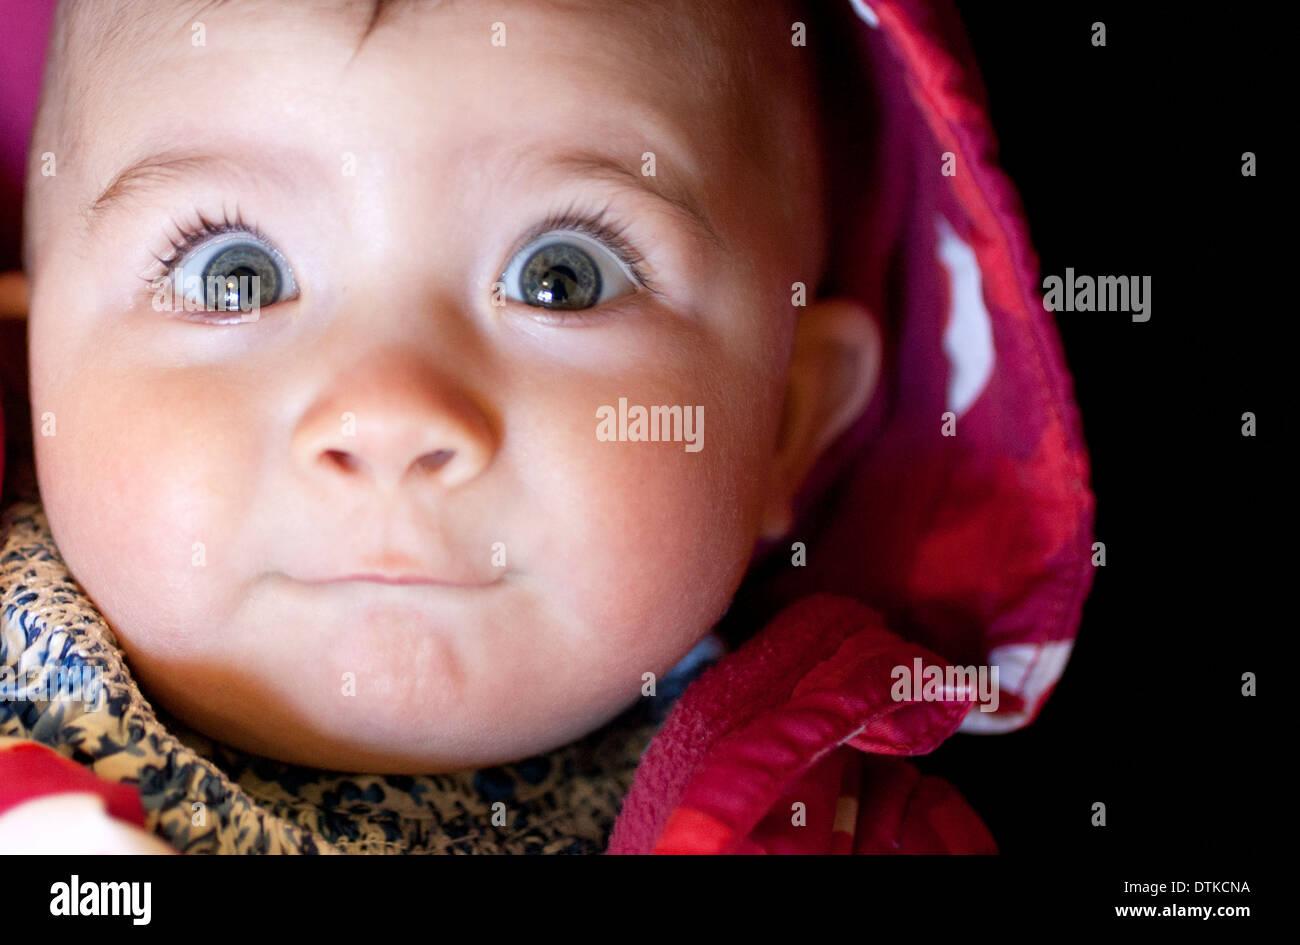 Cerca de la cara de sorpresa del bebé niñaFoto de stock